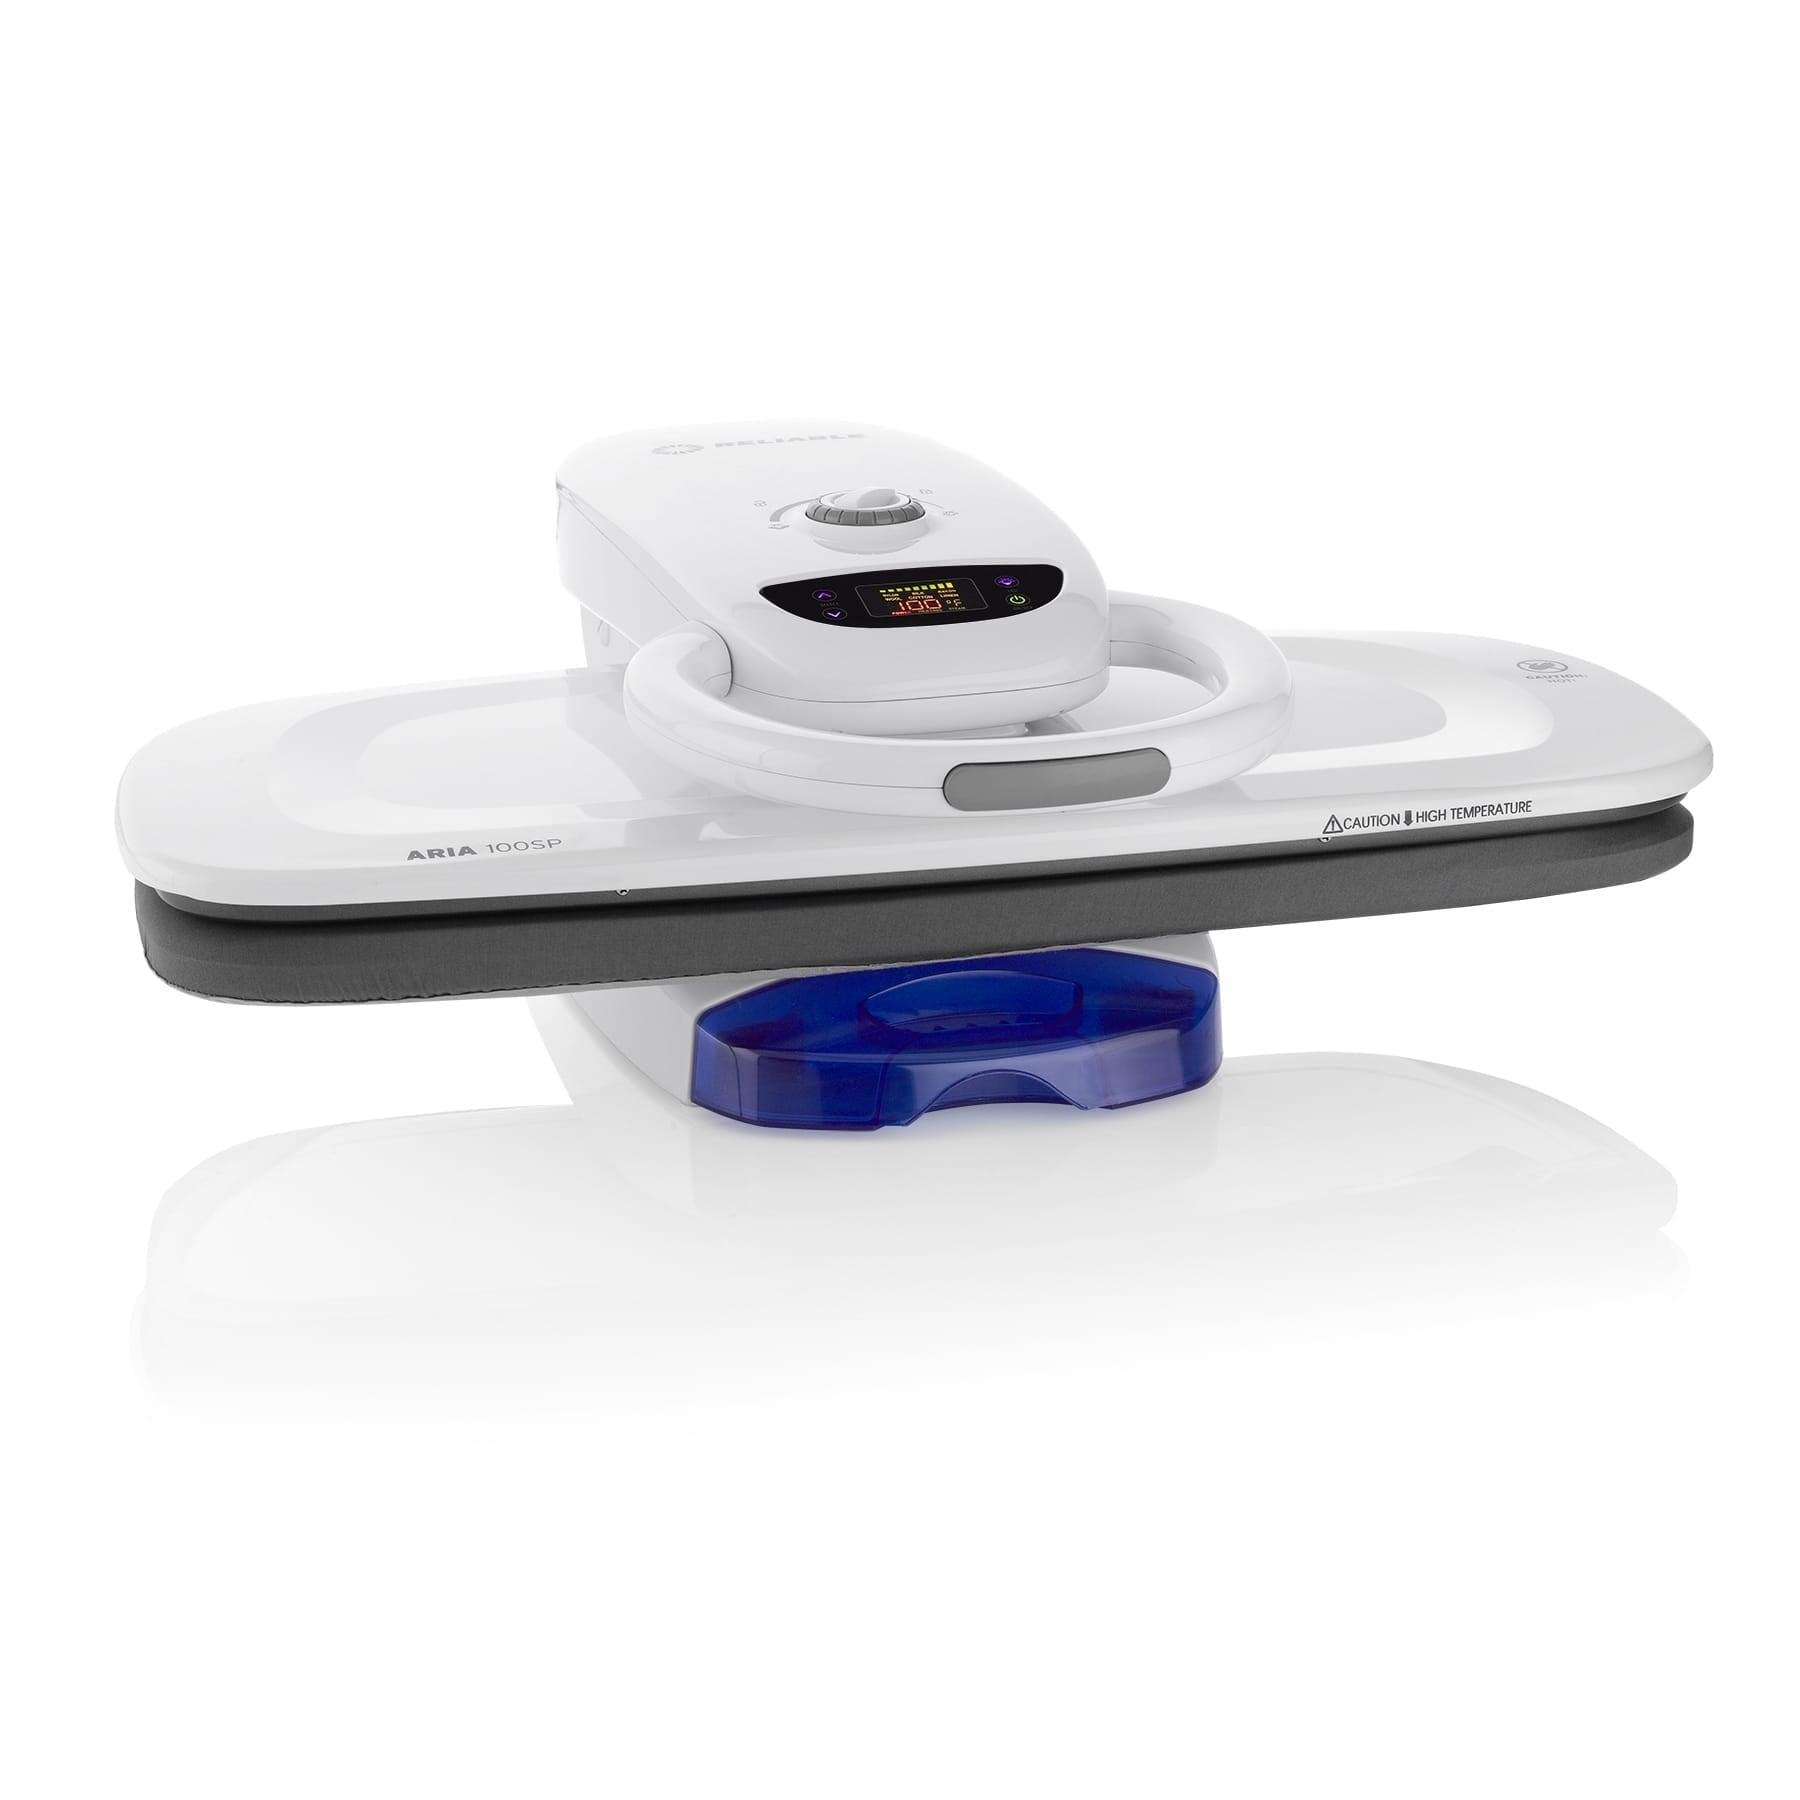 "Reliable Aria 100SP LED Digital Steam Press (28""), White ..."